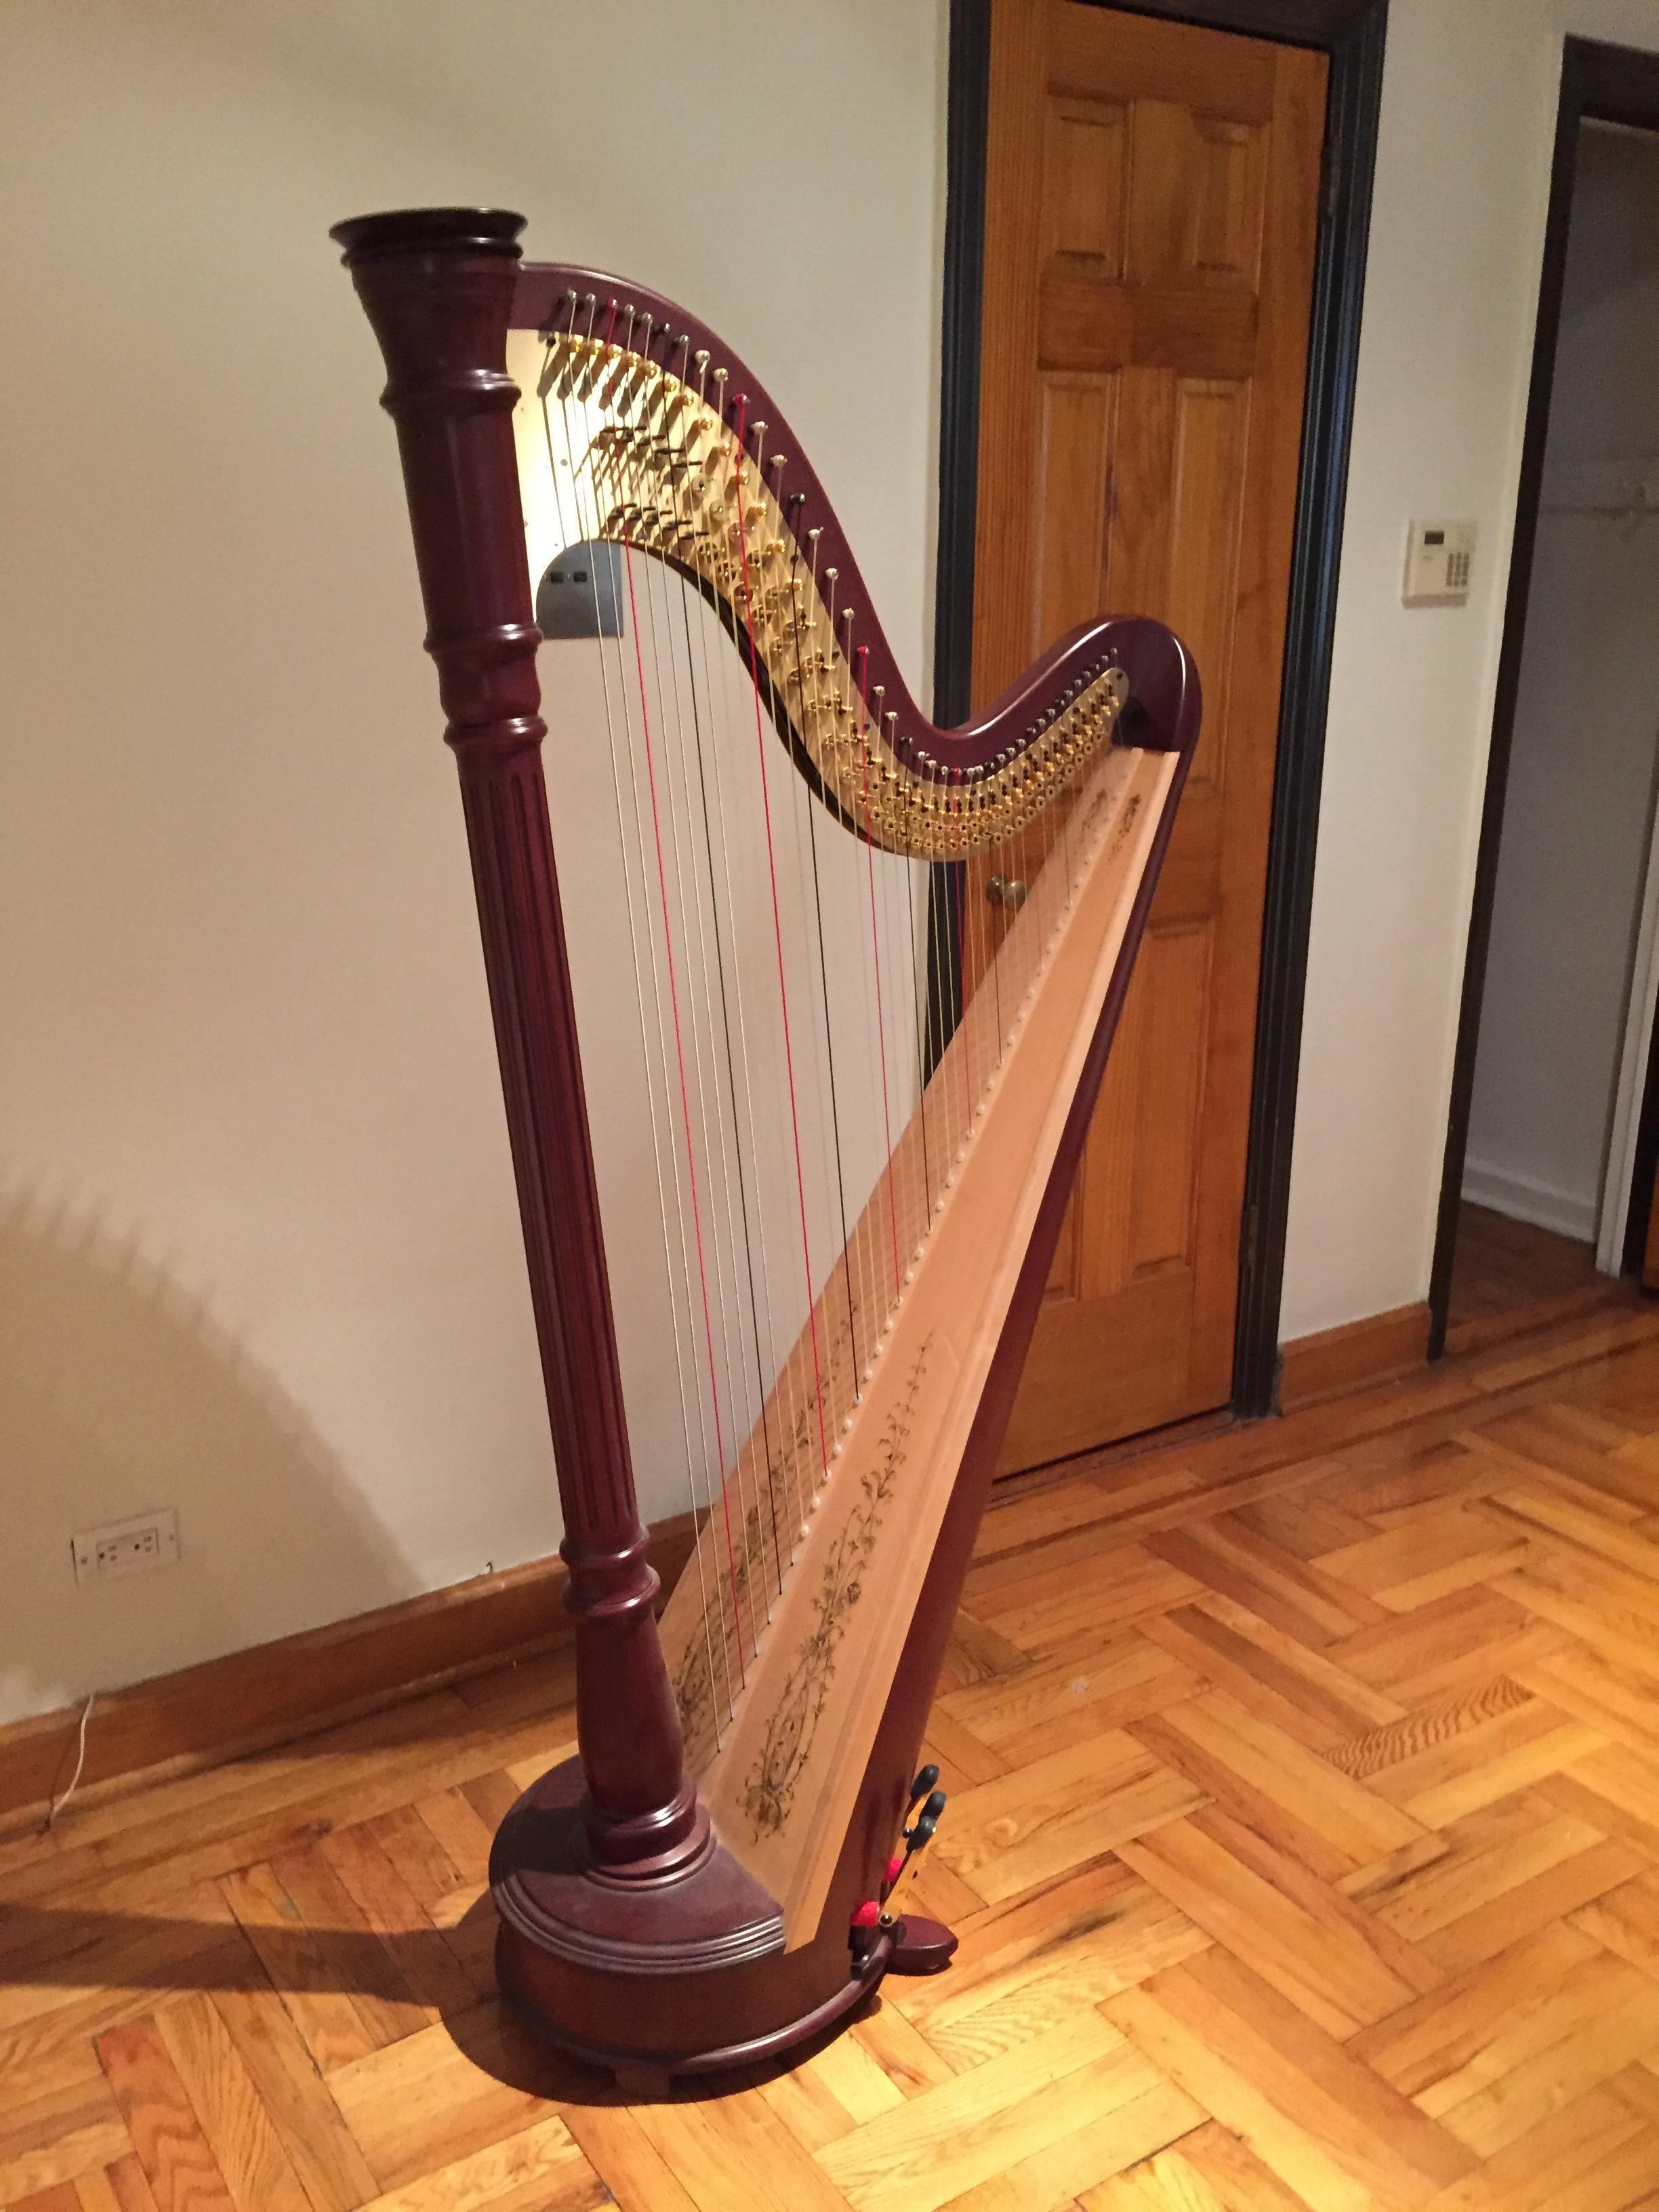 My beautiful harp